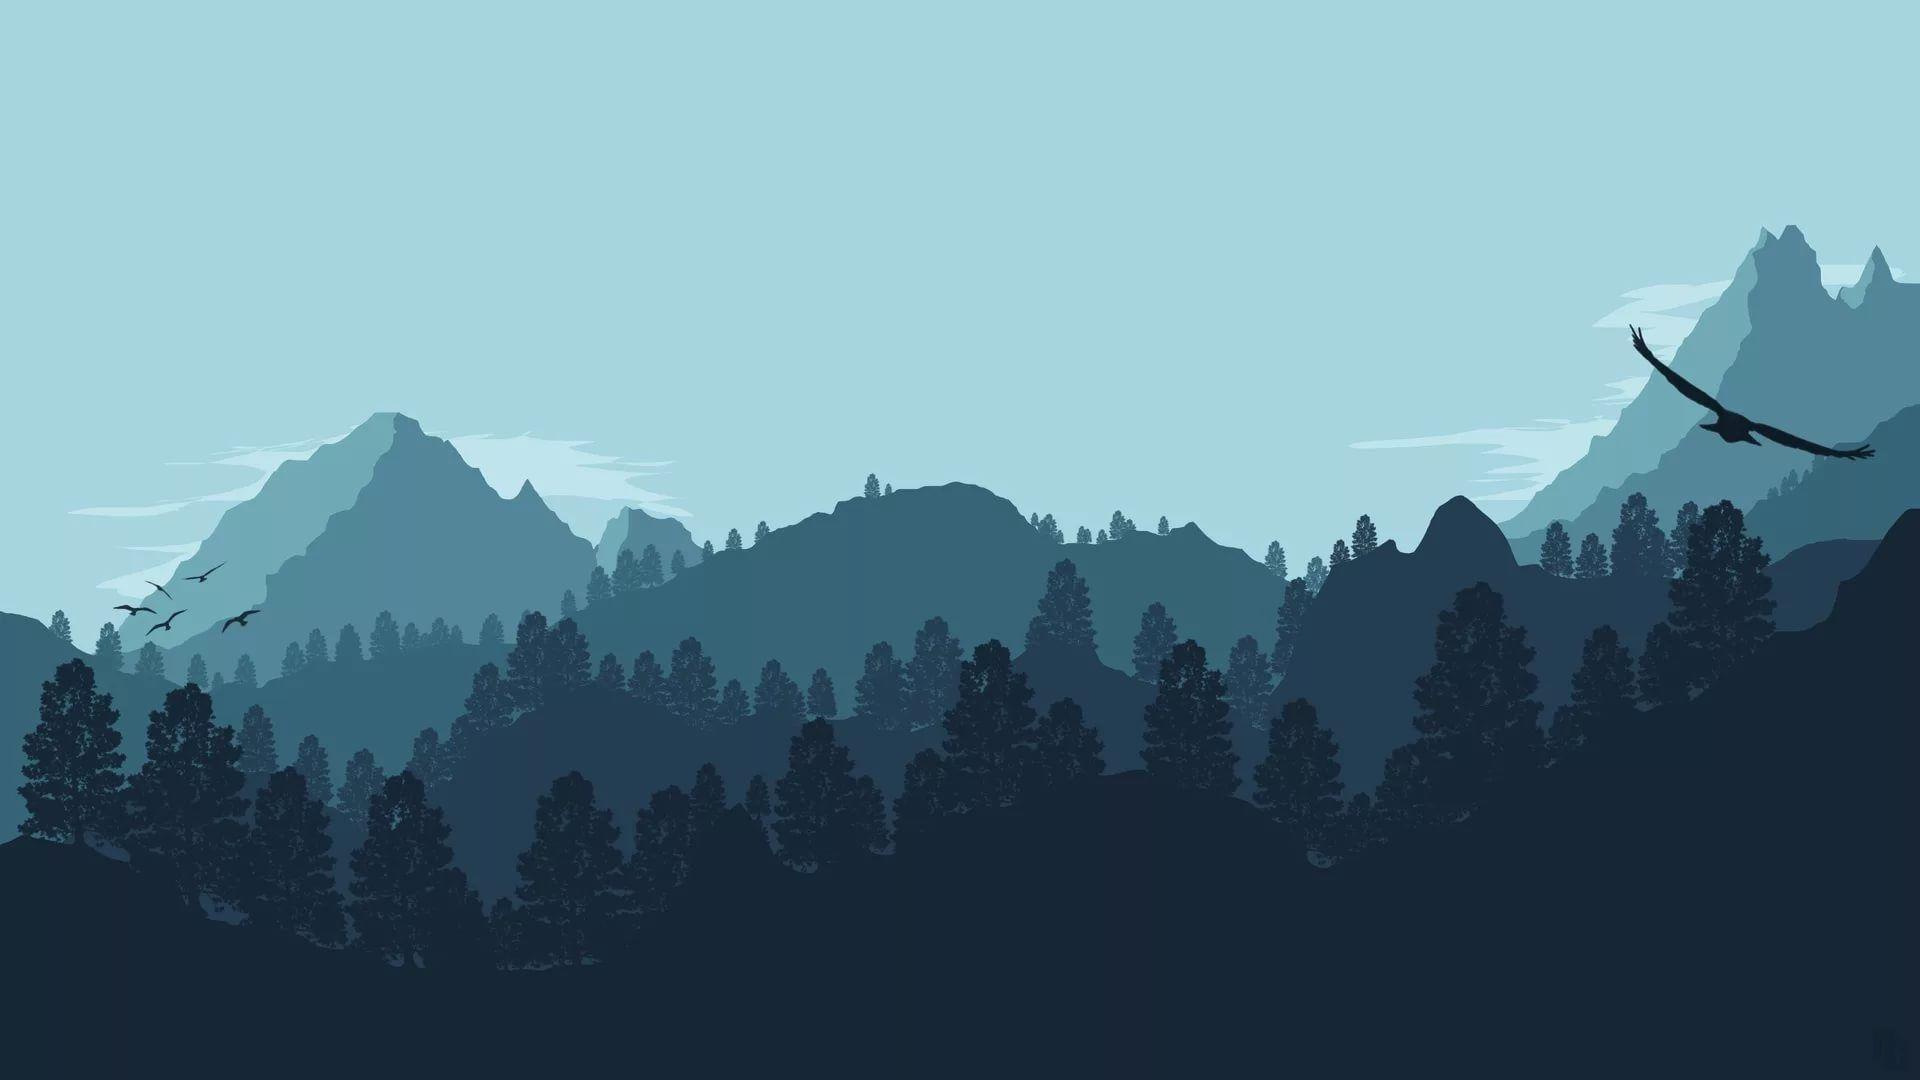 Minimalist Desktop full wallpaper